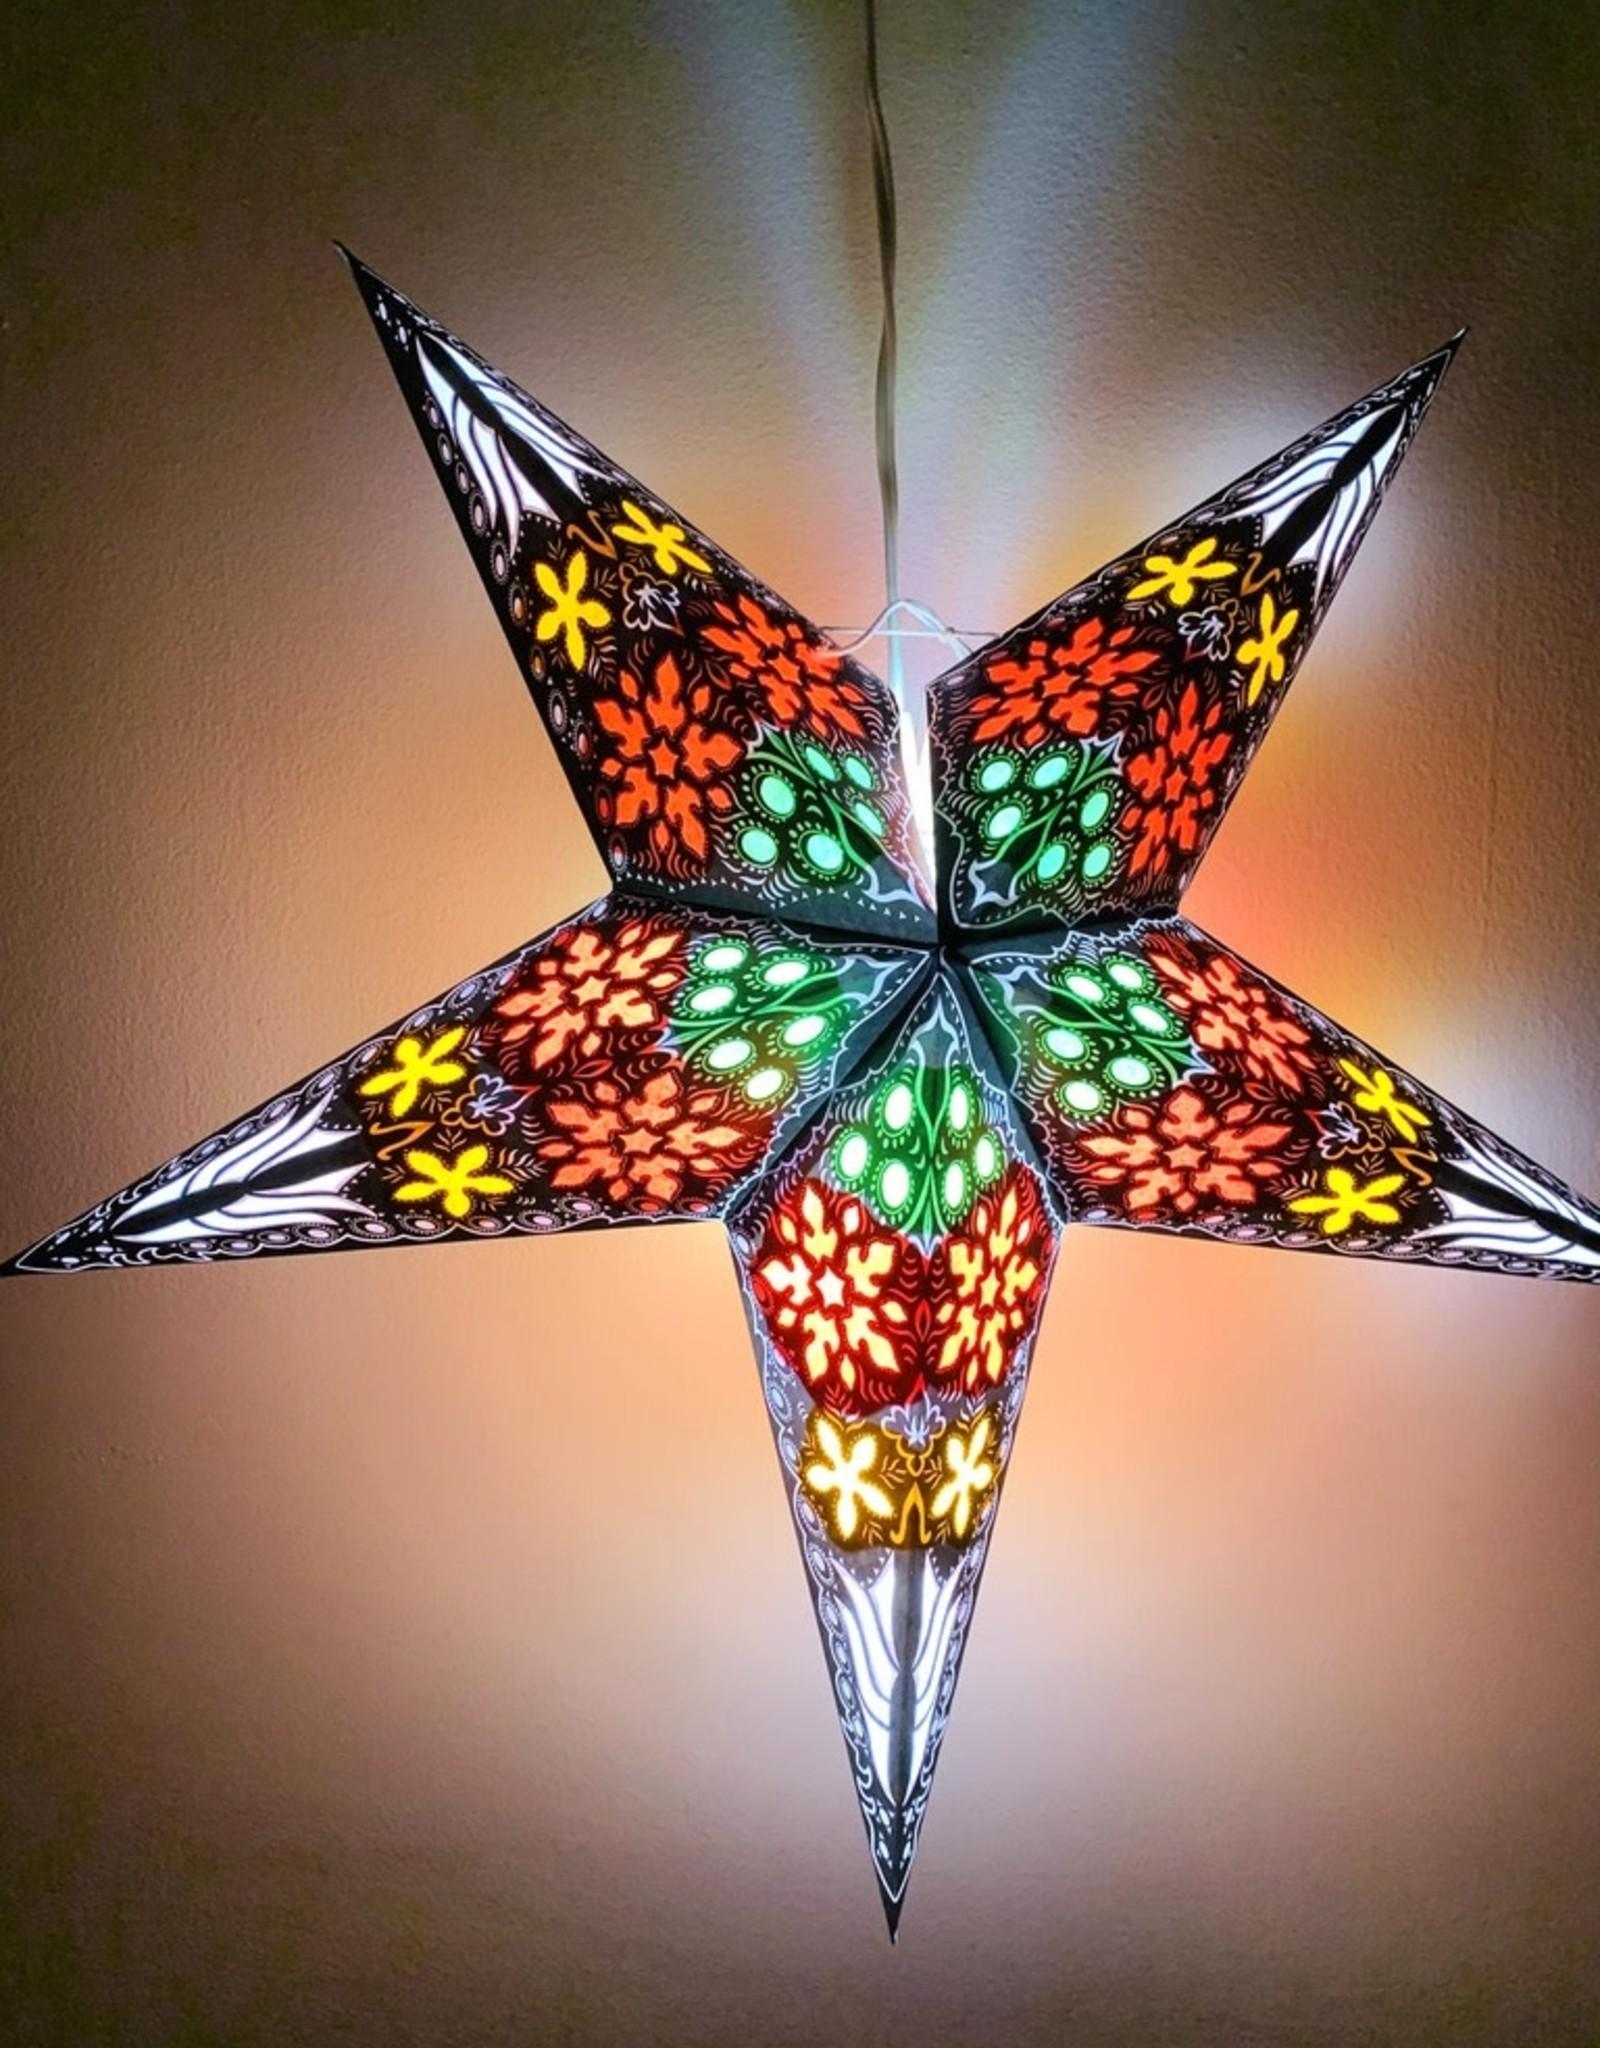 Supernova Star Light with 12' Cord